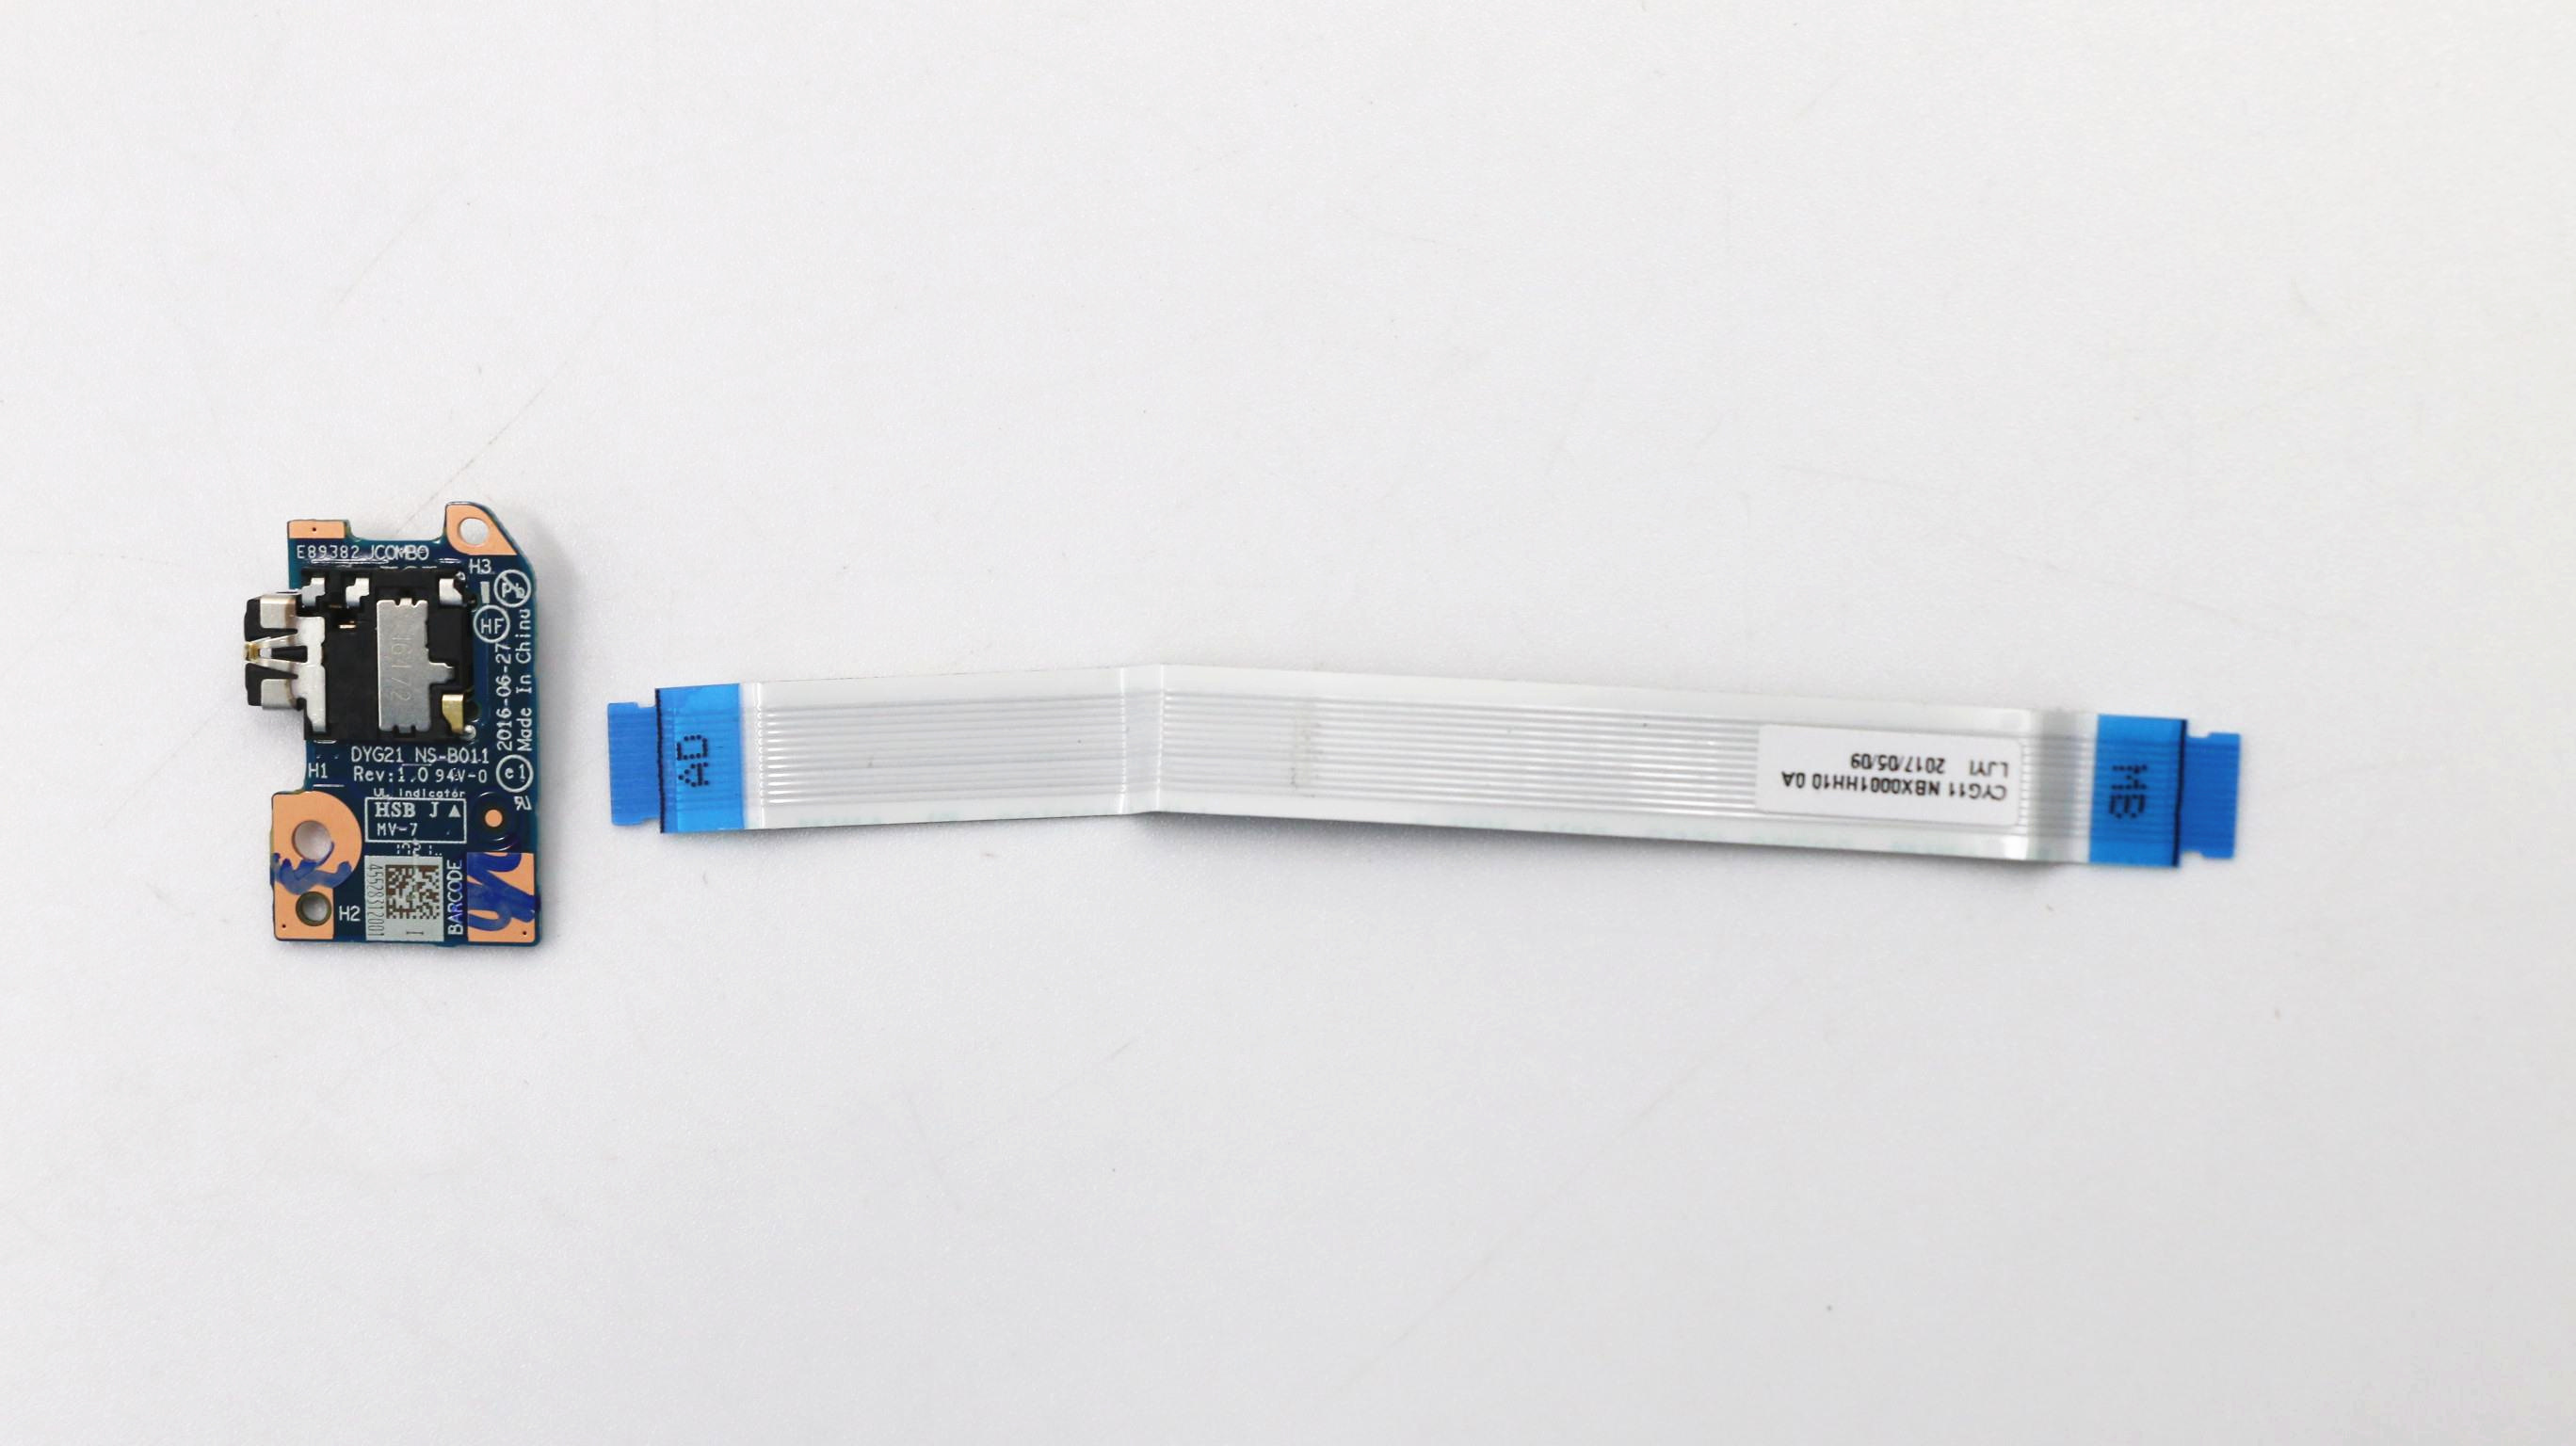 DYG21 NS-B011 для Ideapad Yoga 710-11IKB, аудиоплата для ноутбука с кабелем 5c50m42030